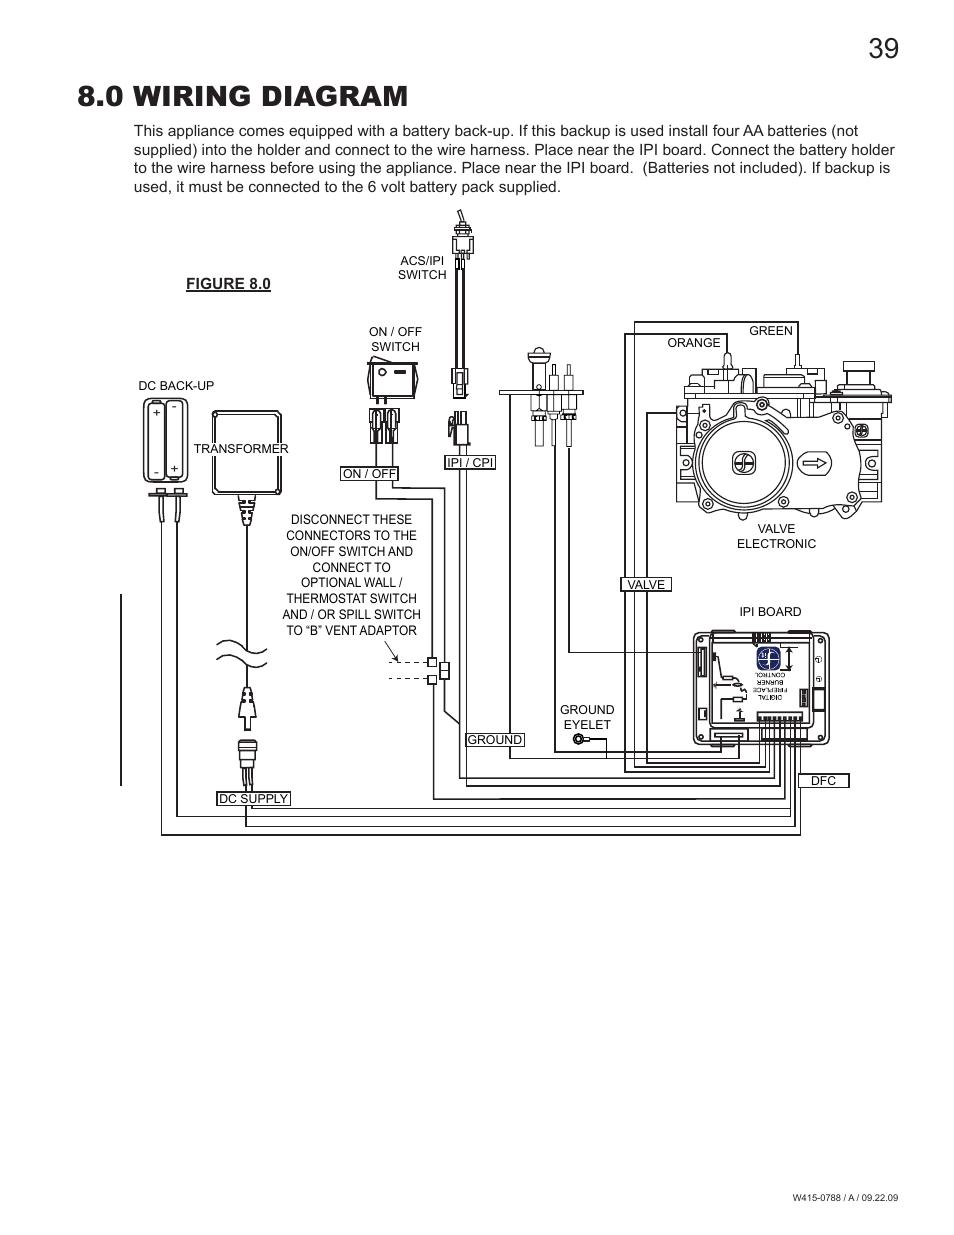 medium resolution of fireplace wiring diagram wiring diagram centre wiring diagram for napoleon gas fireplace